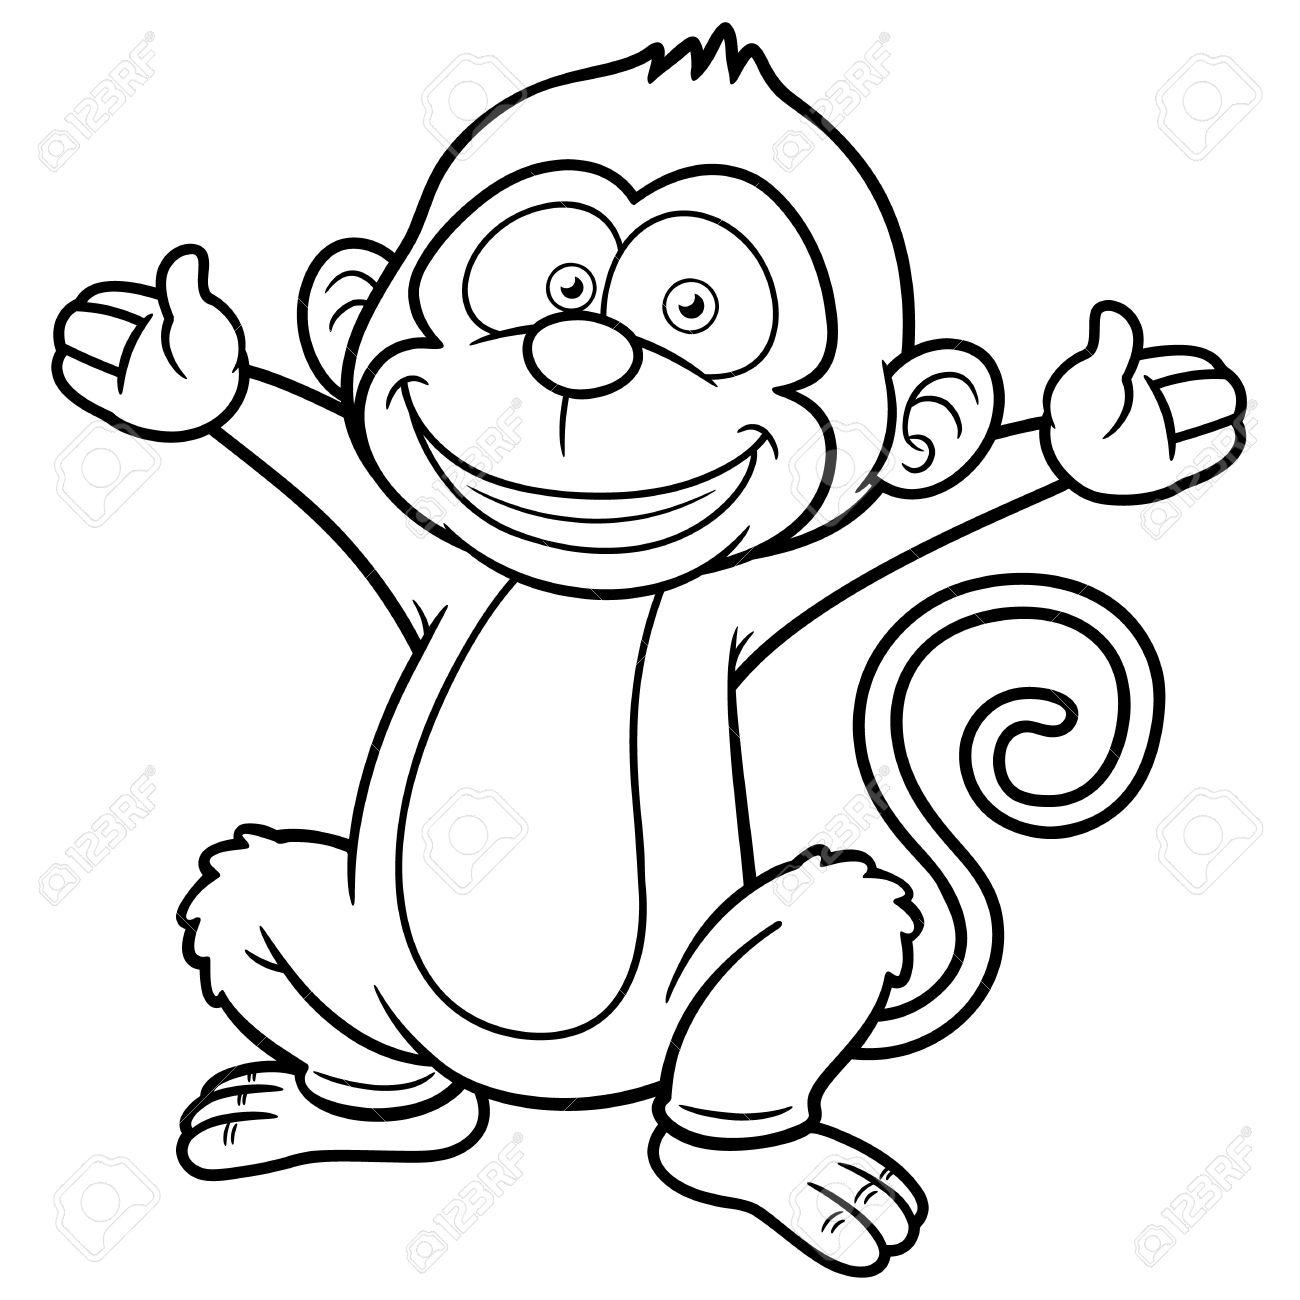 Vector Illustration Of Cartoon Monkey - Coloring Book Royalty Free ...